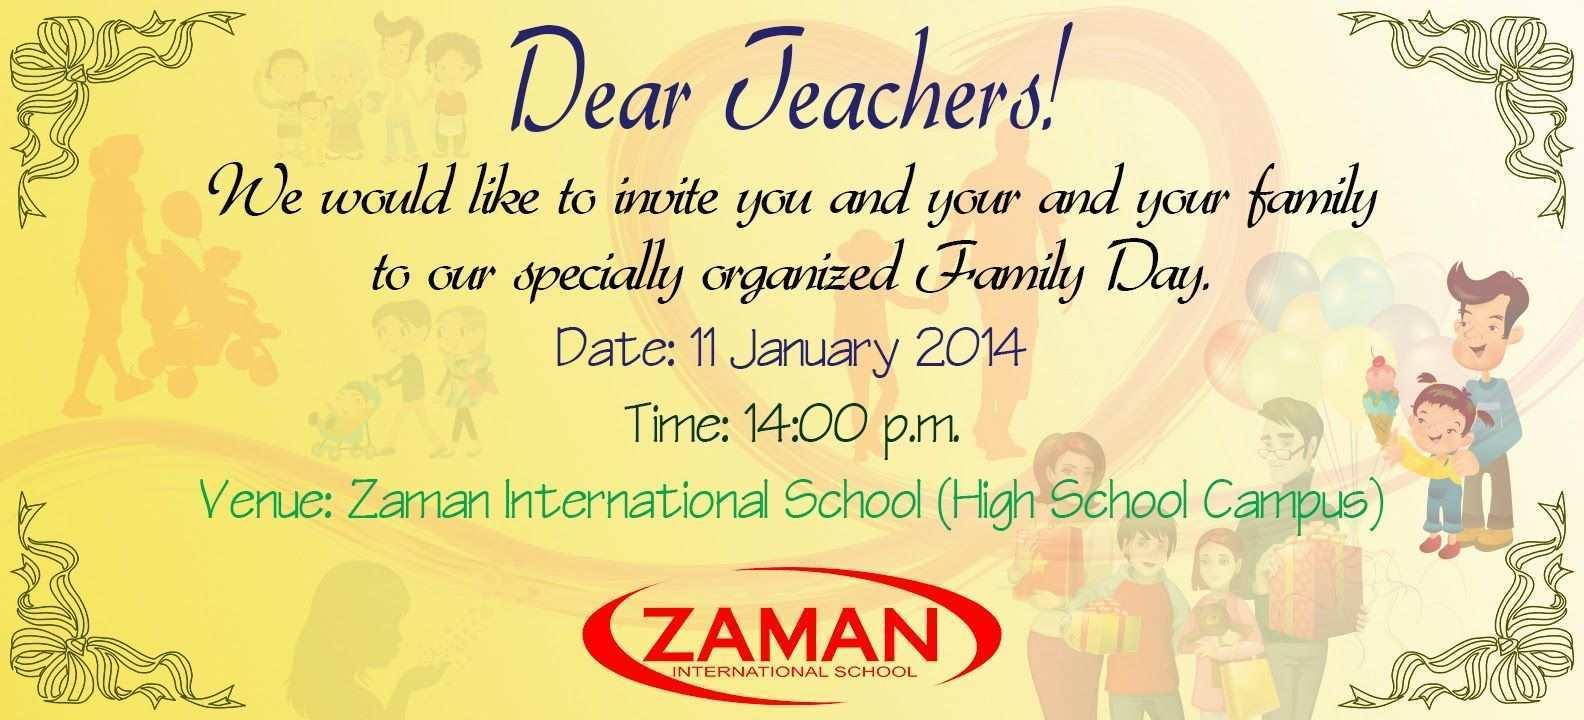 Invitation Card Format For Teachers - Cards Design Templates